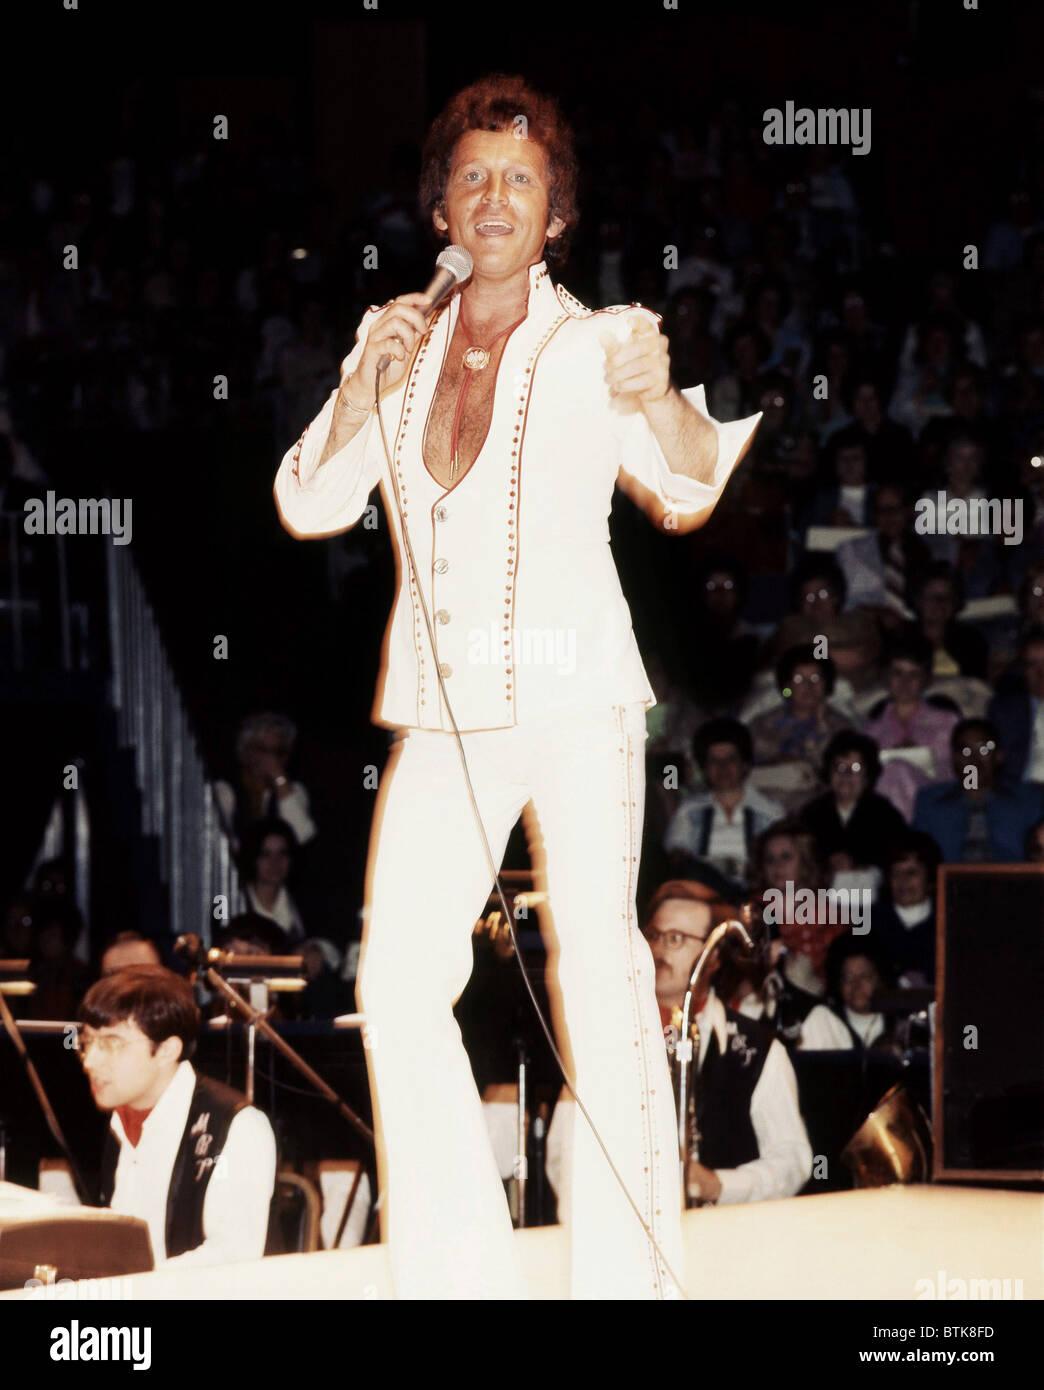 Bobby Vinton, 1975, Millrun Playhouse Theater in the Round, Niles, Illinois. - Stock Image